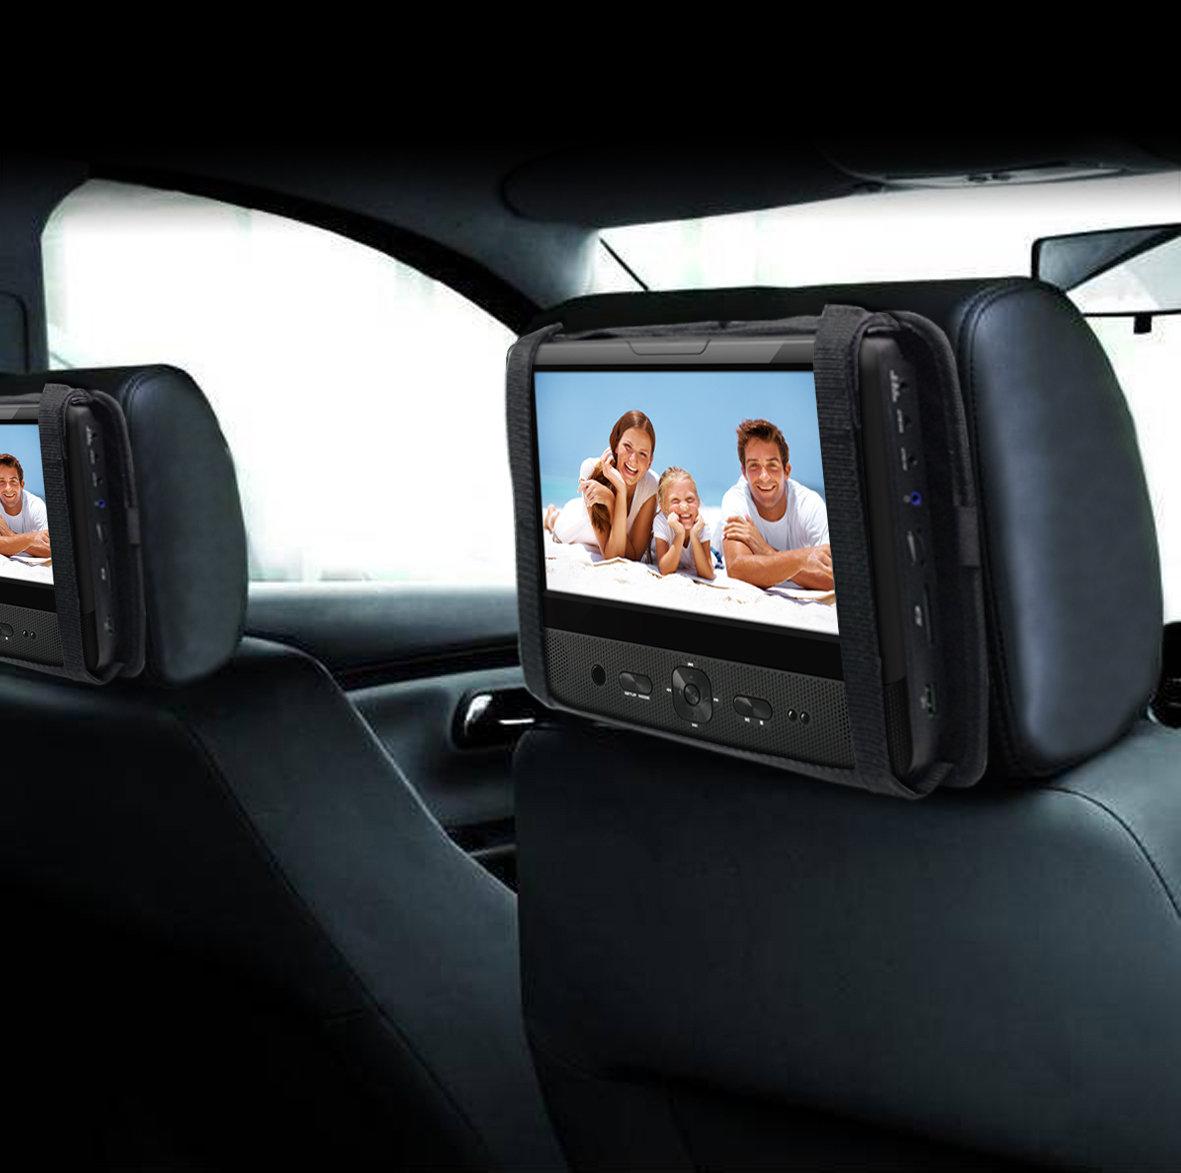 odys megaro plus tragbarer dvd player tv mit zus tzlichem. Black Bedroom Furniture Sets. Home Design Ideas